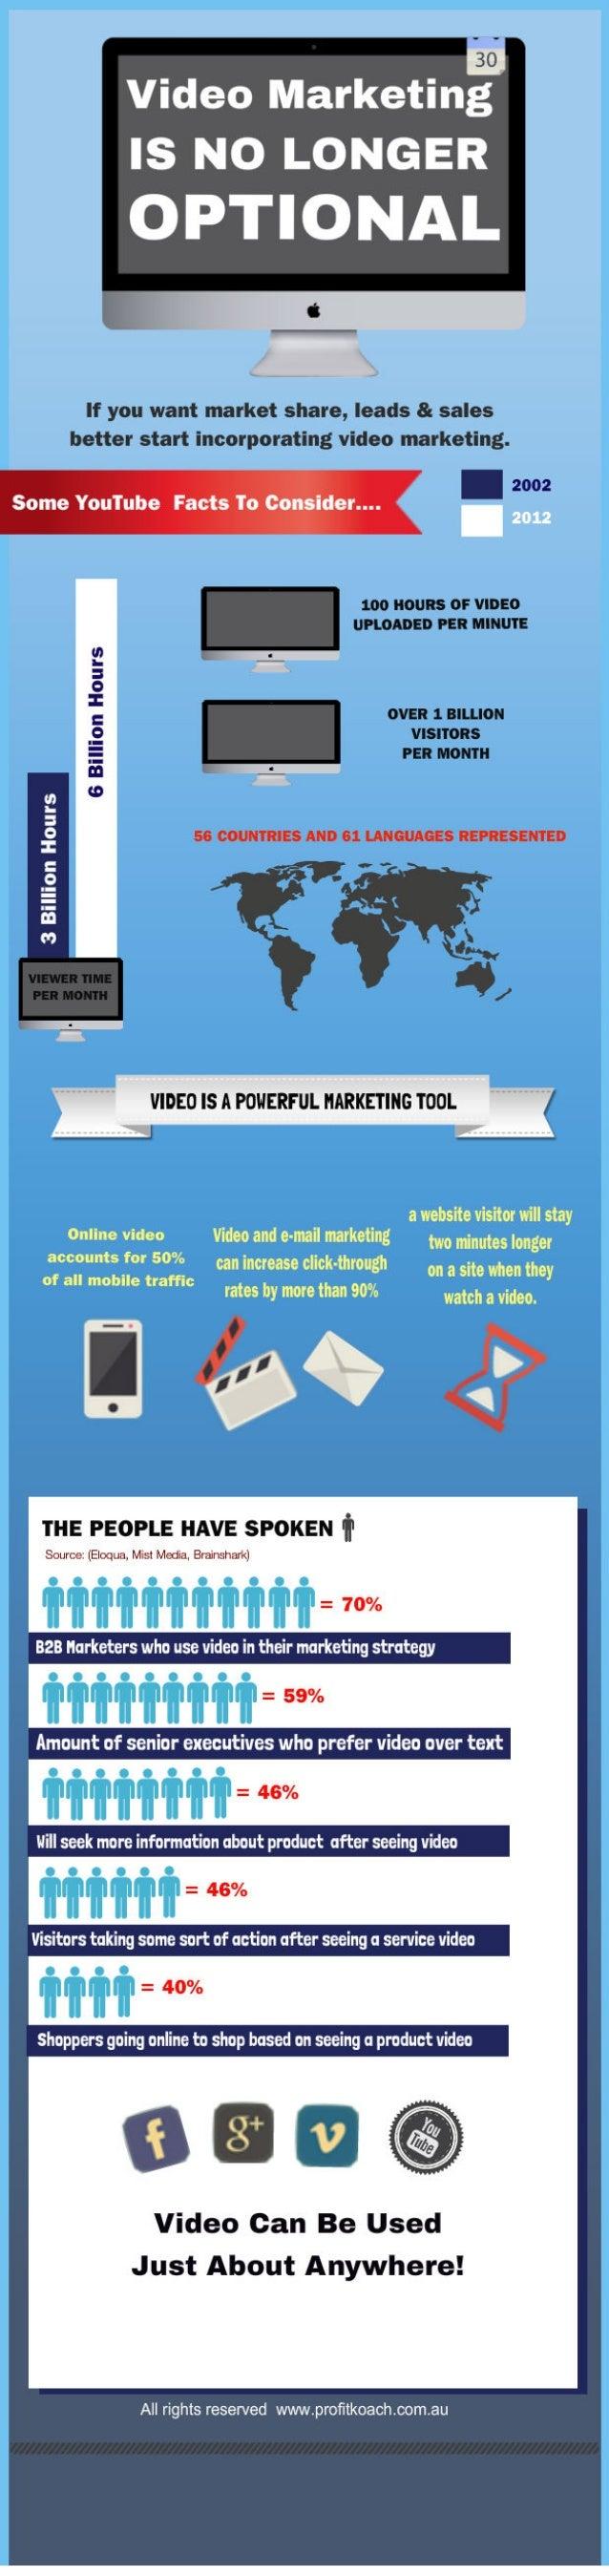 Small Business Needs Video Marketing